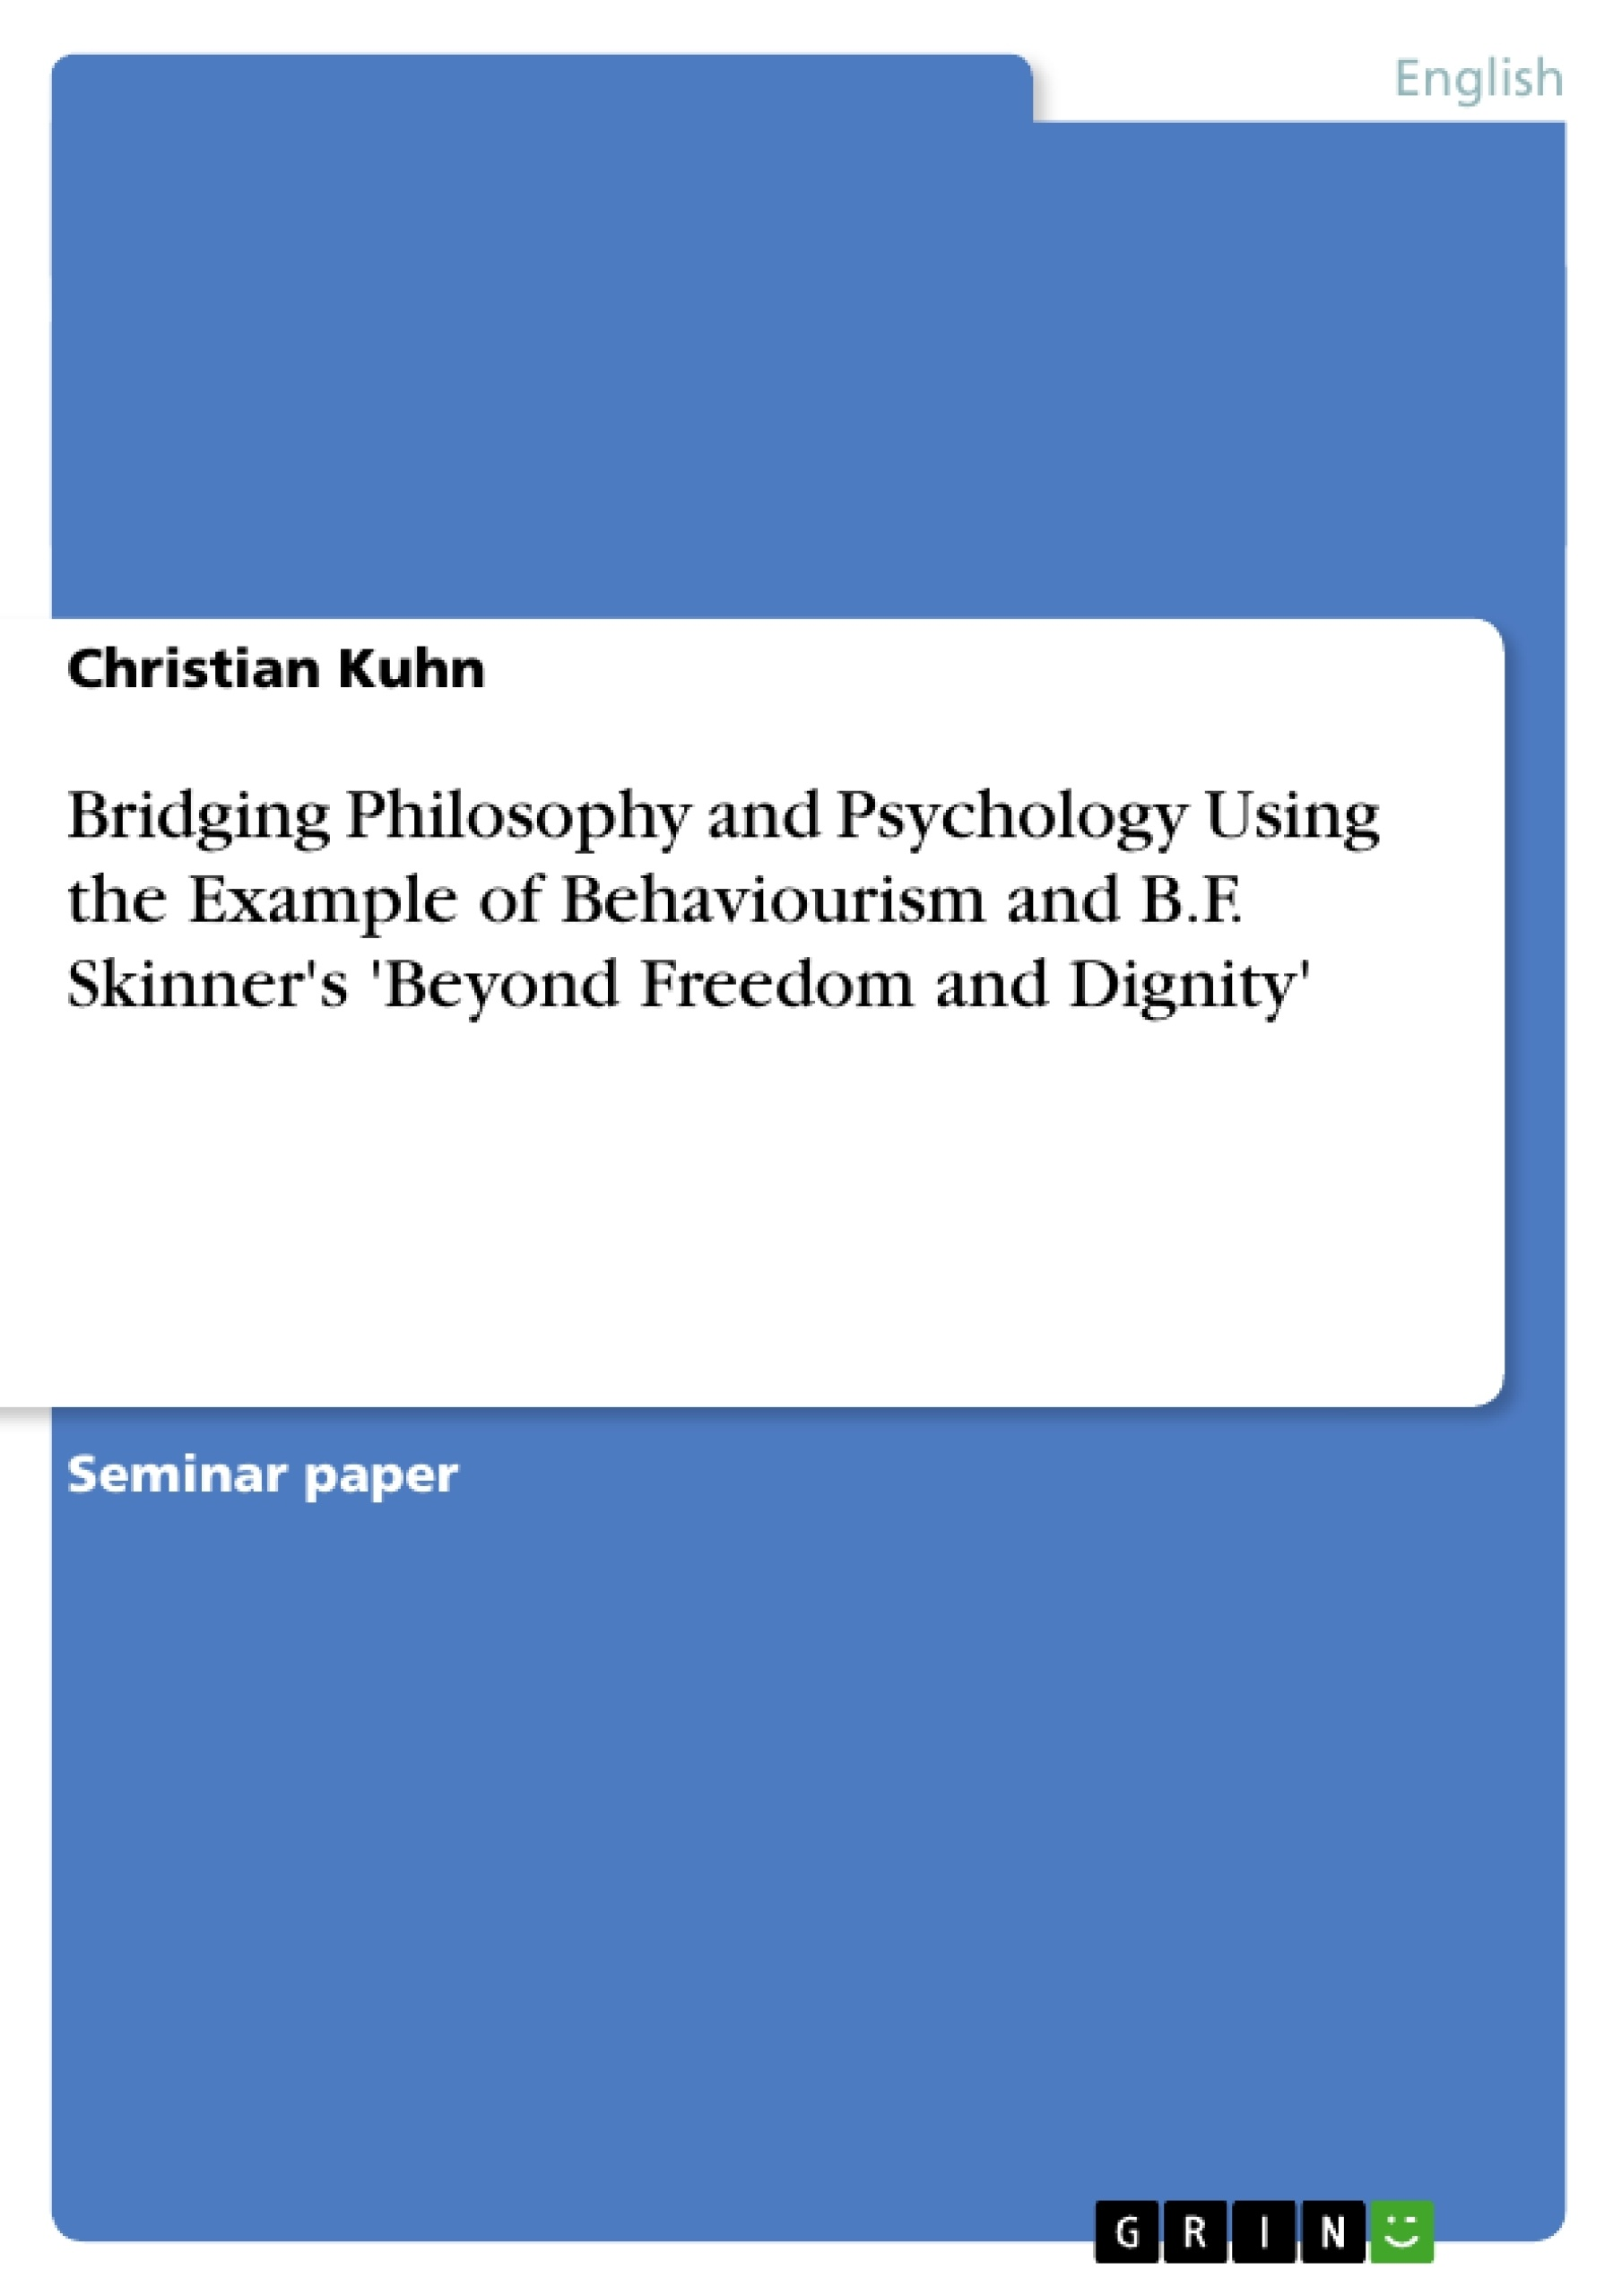 Philosophy essay publication